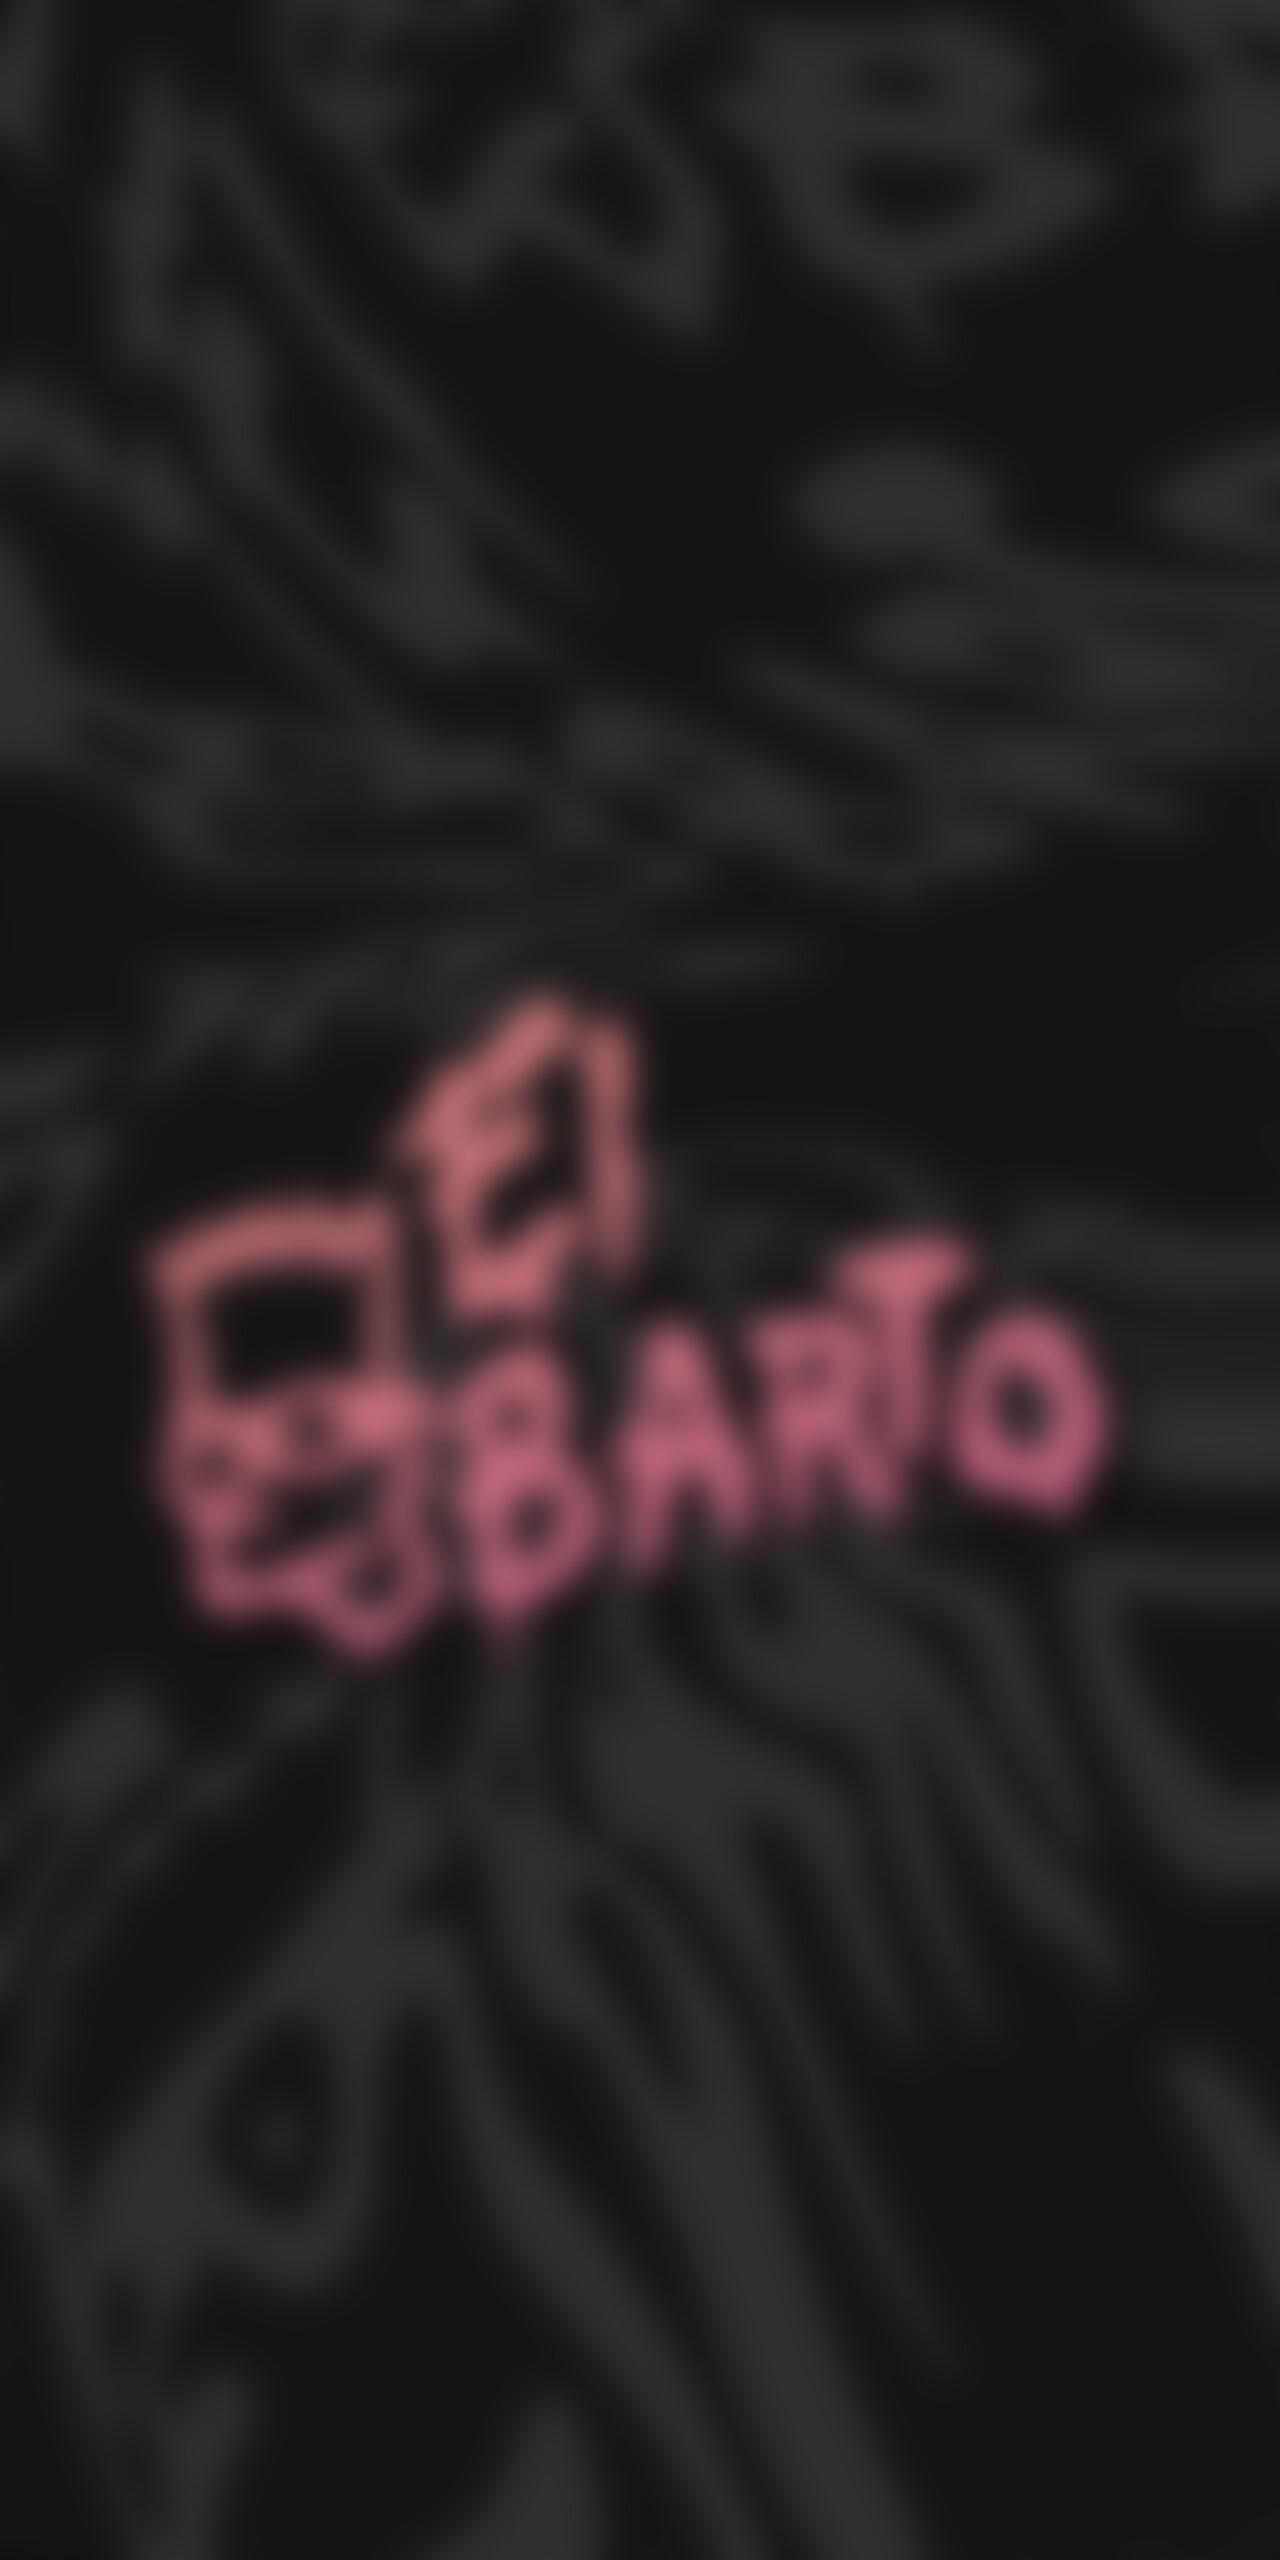 simpsons el barto pink black blur wallpaper